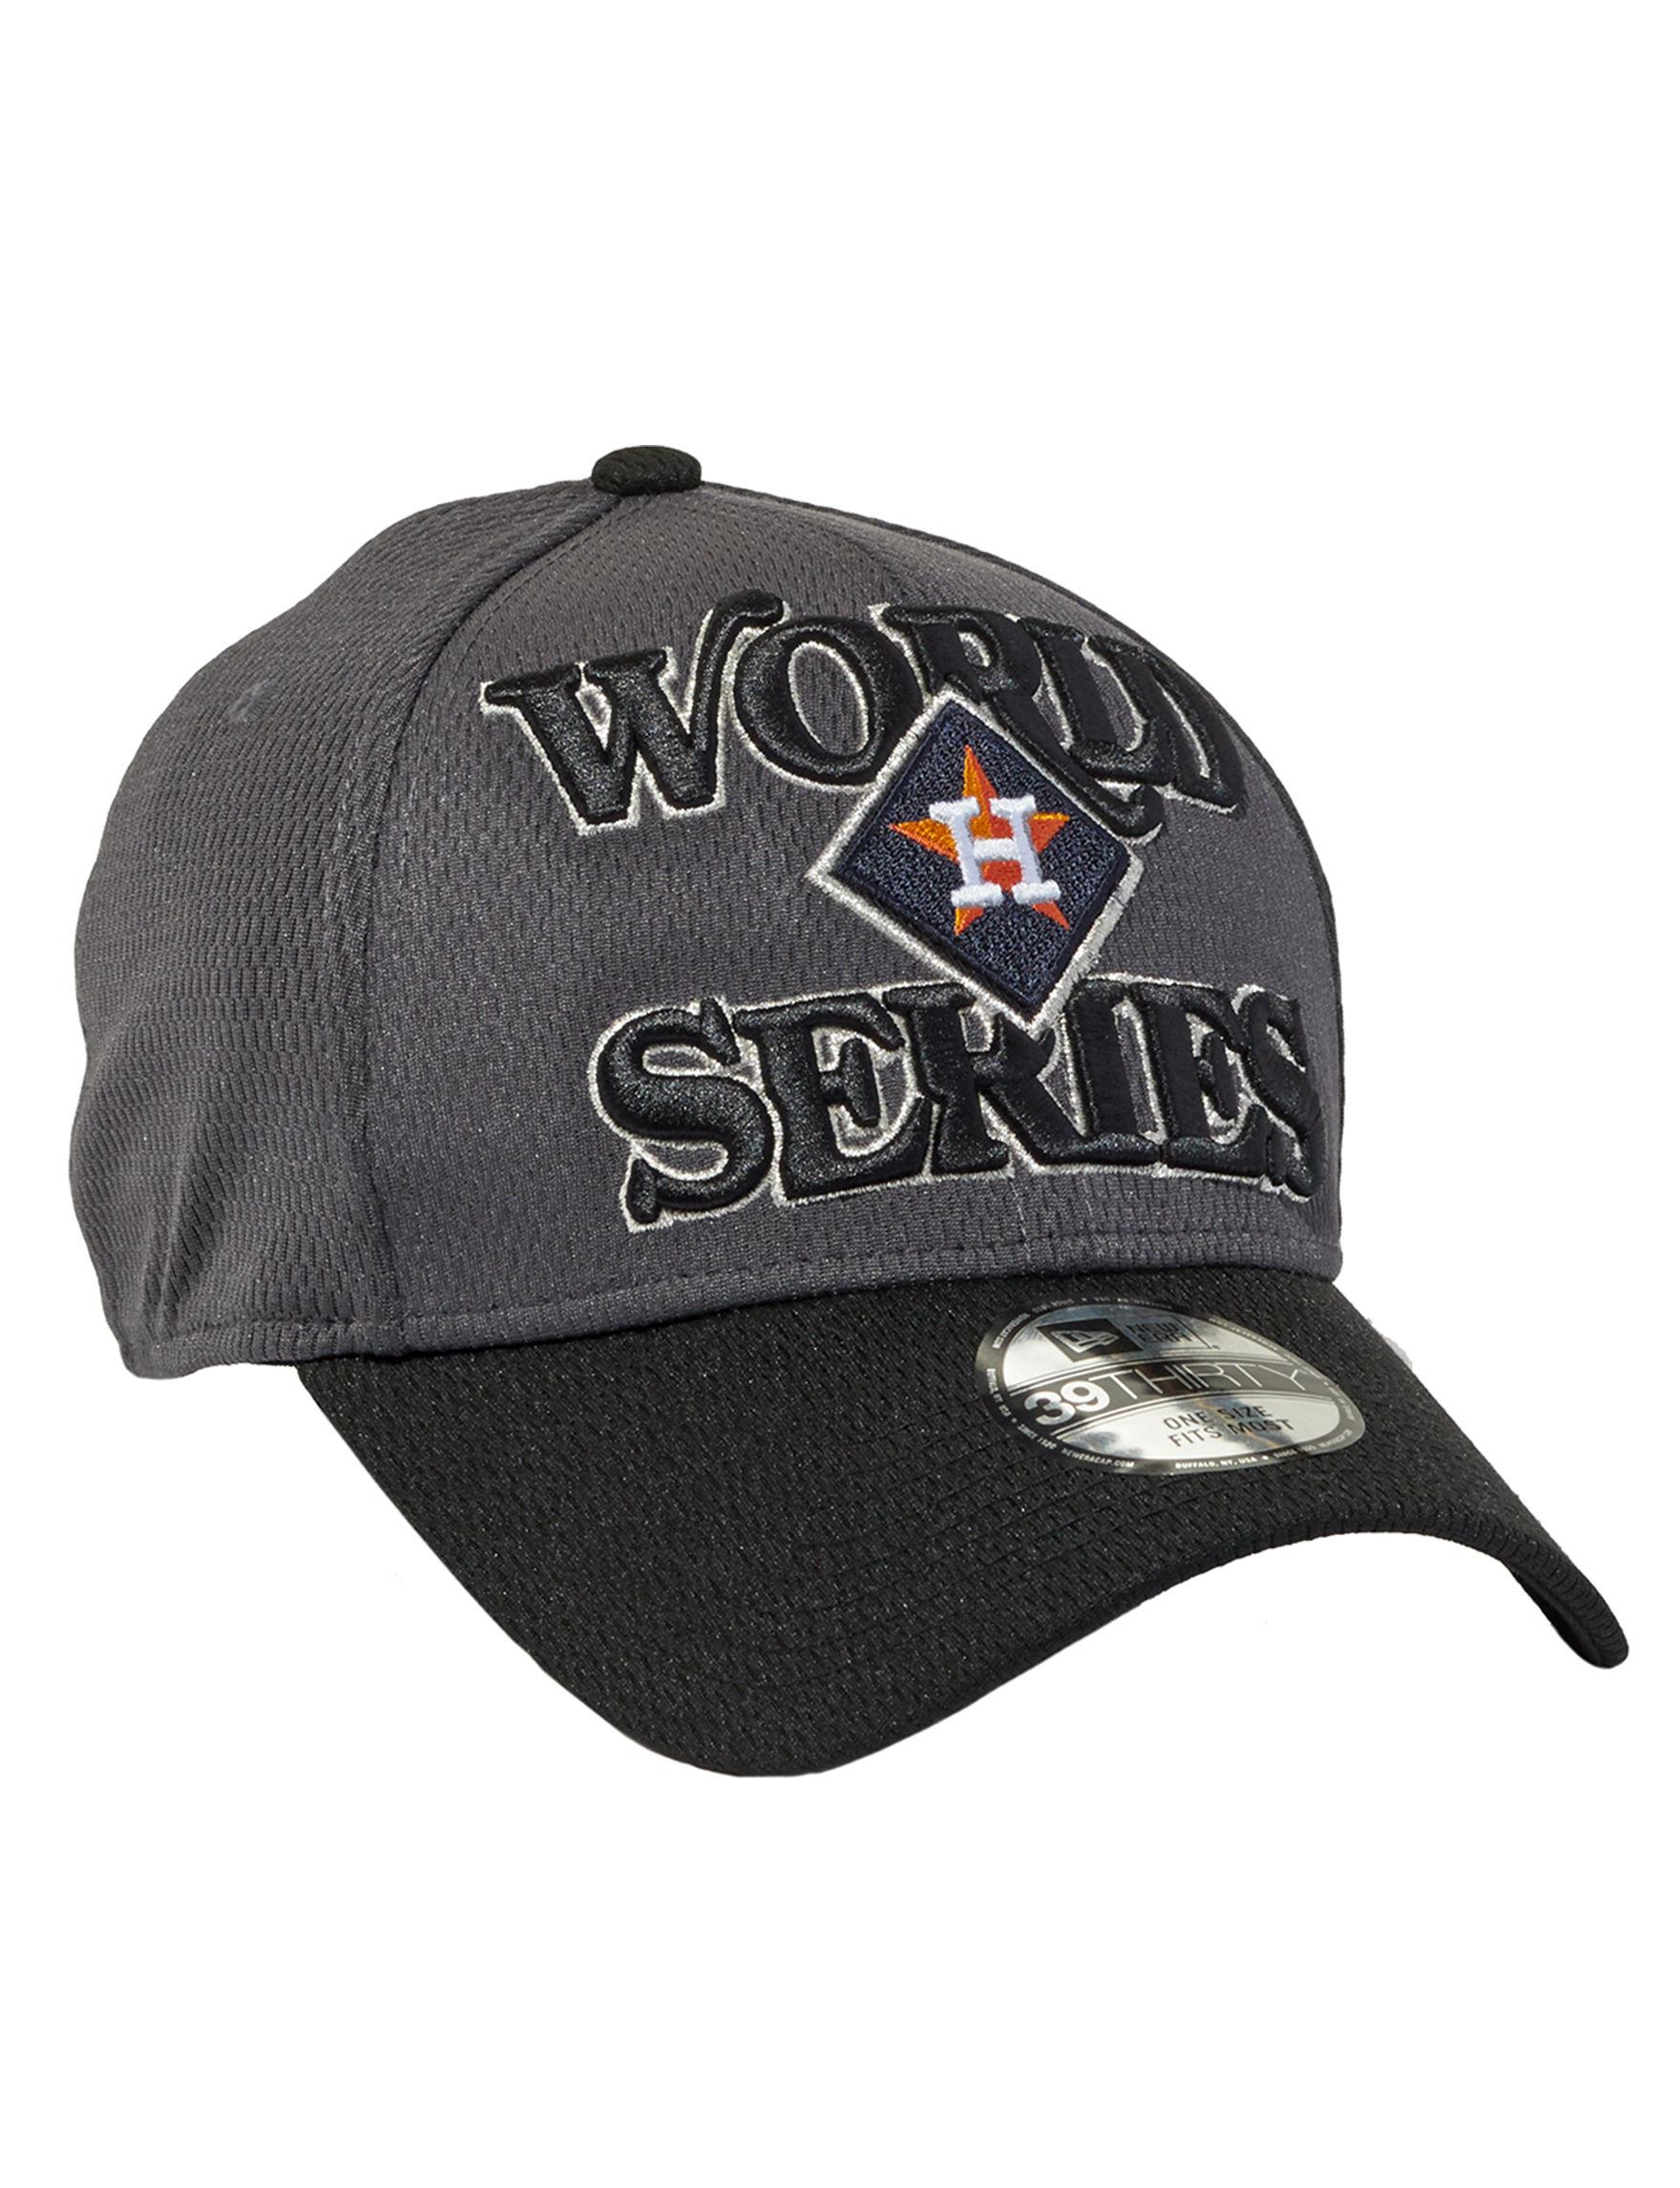 MLB Dark Grey Baseball Caps Hats & Headwear